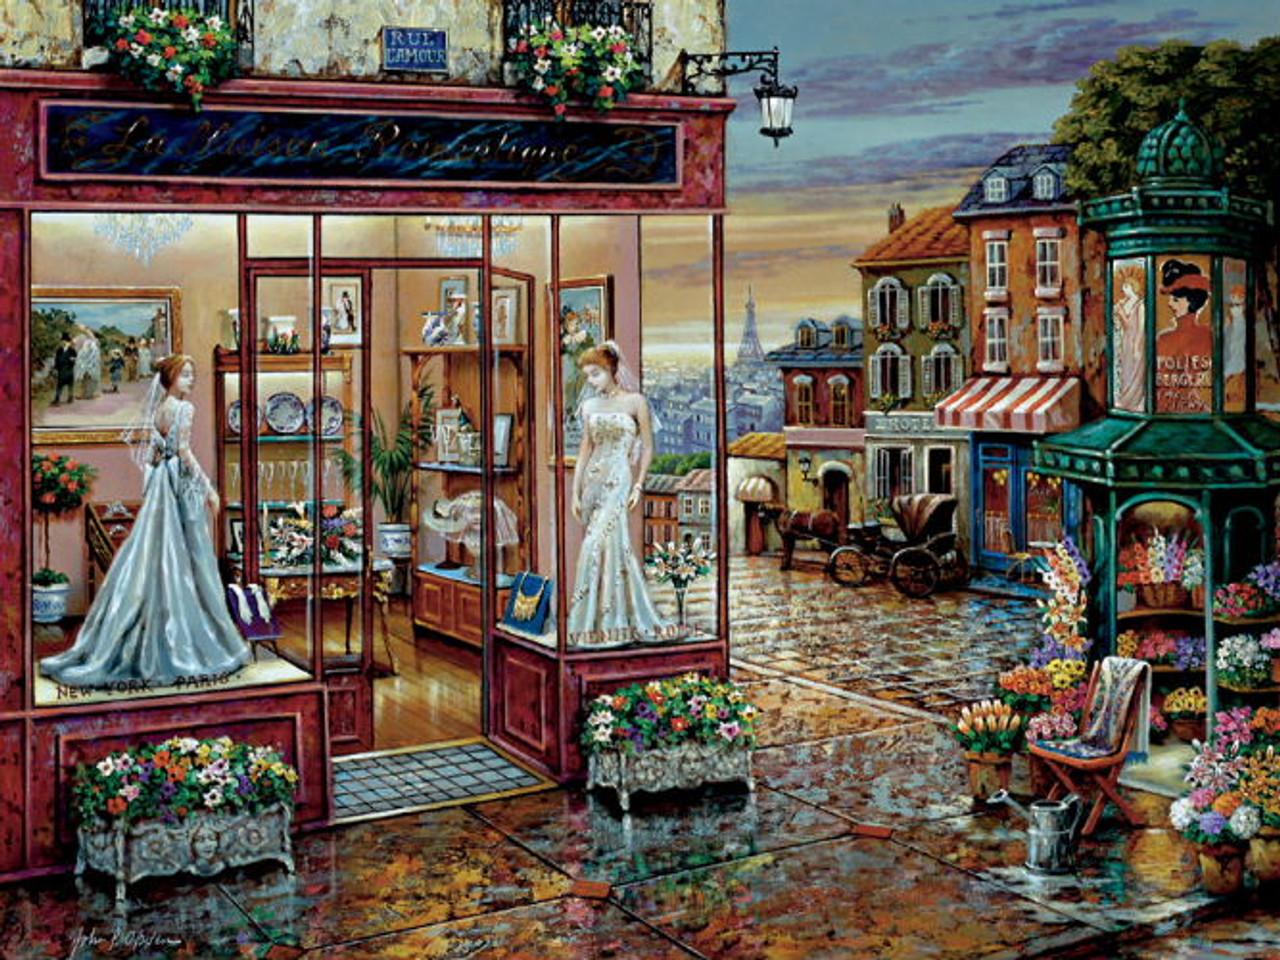 The Wedding Shop Jigsaw Puzzle 300pc FX Schmid 78835